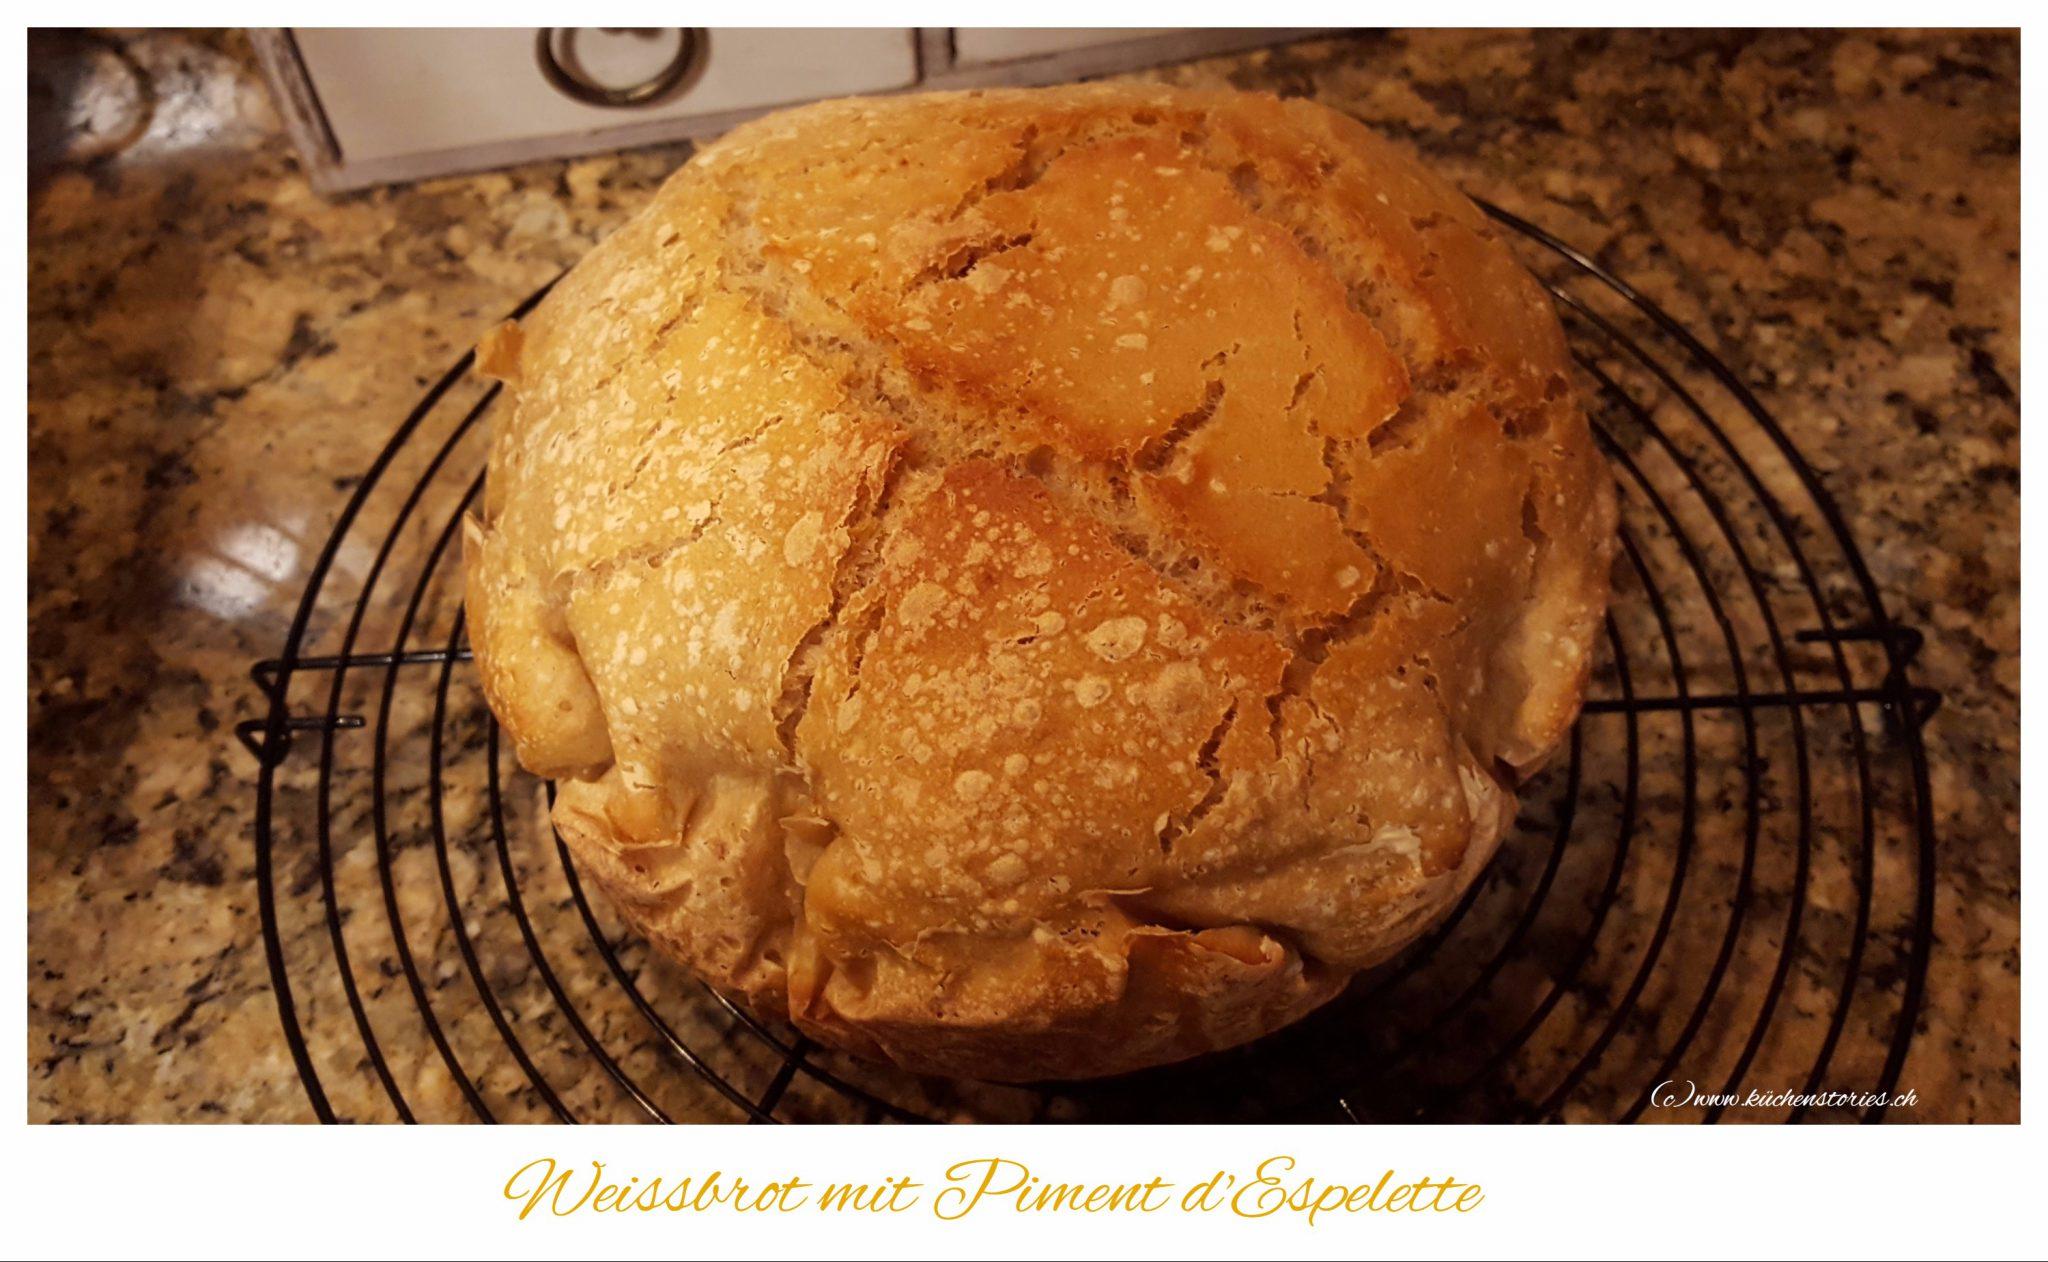 Weissbrot mit Piment d'Espelette